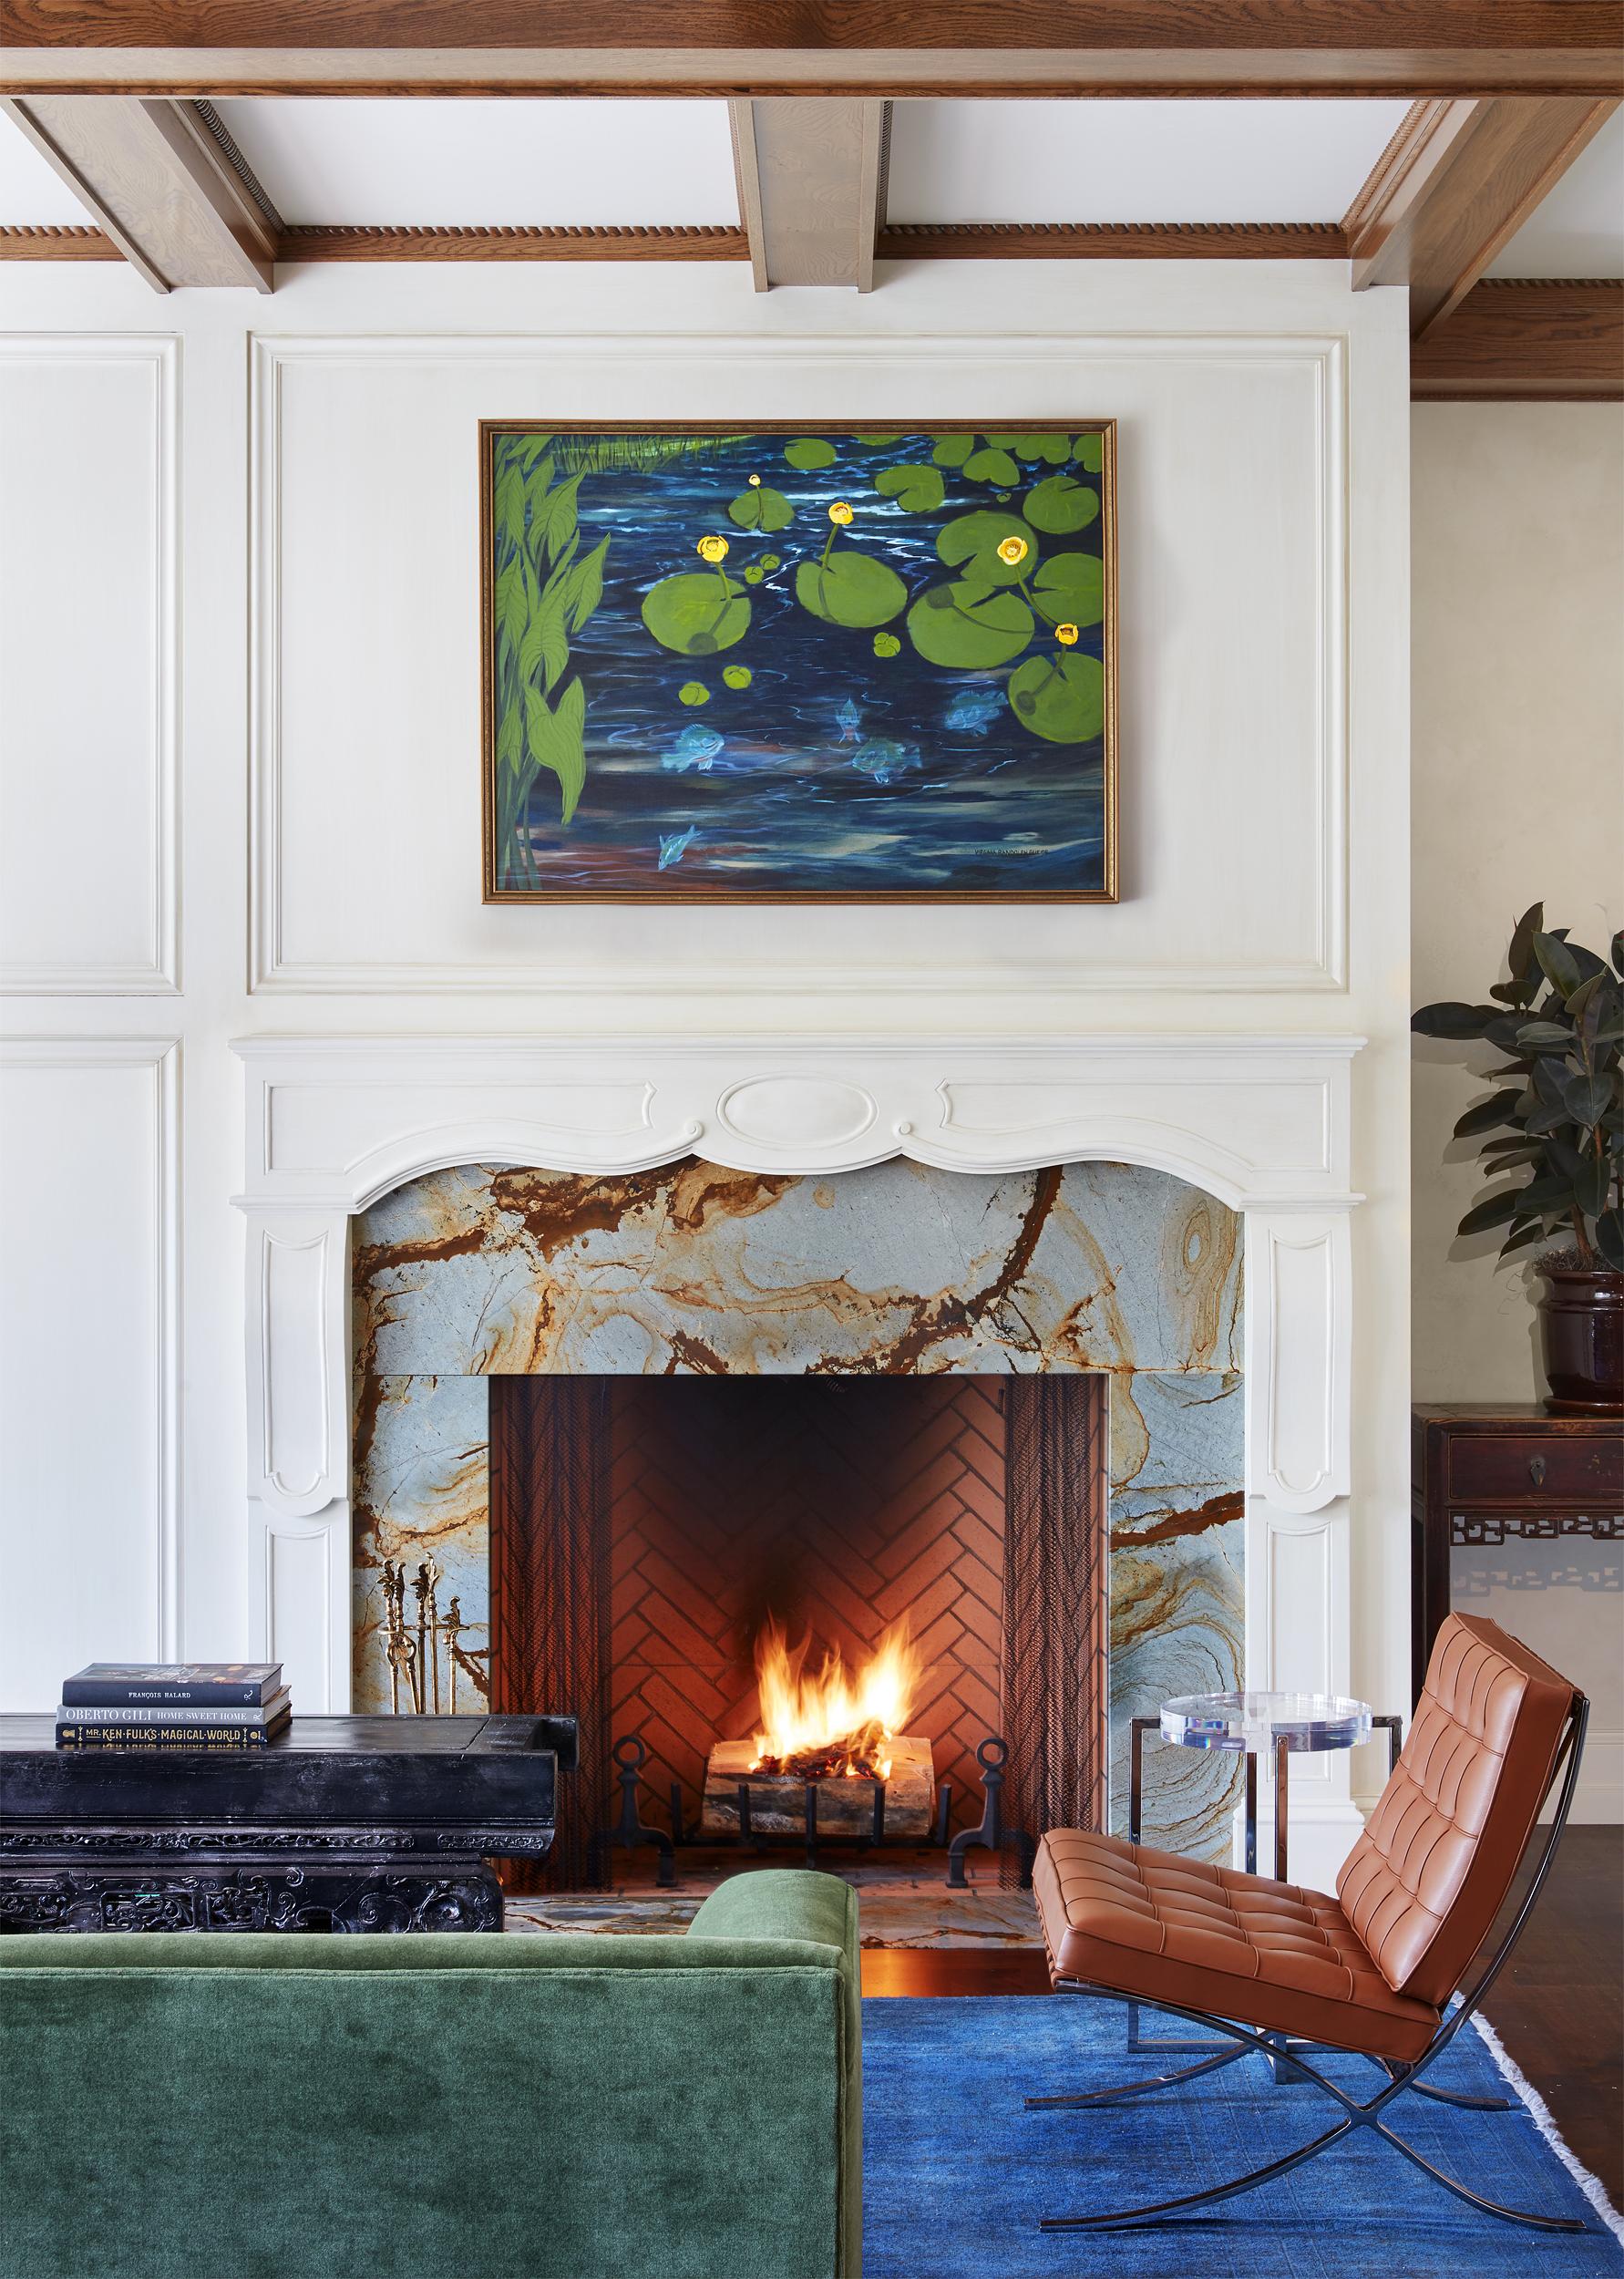 Private Residence - Murphy & Co Design, John Kramer & Sons.,and Twist Interior Design